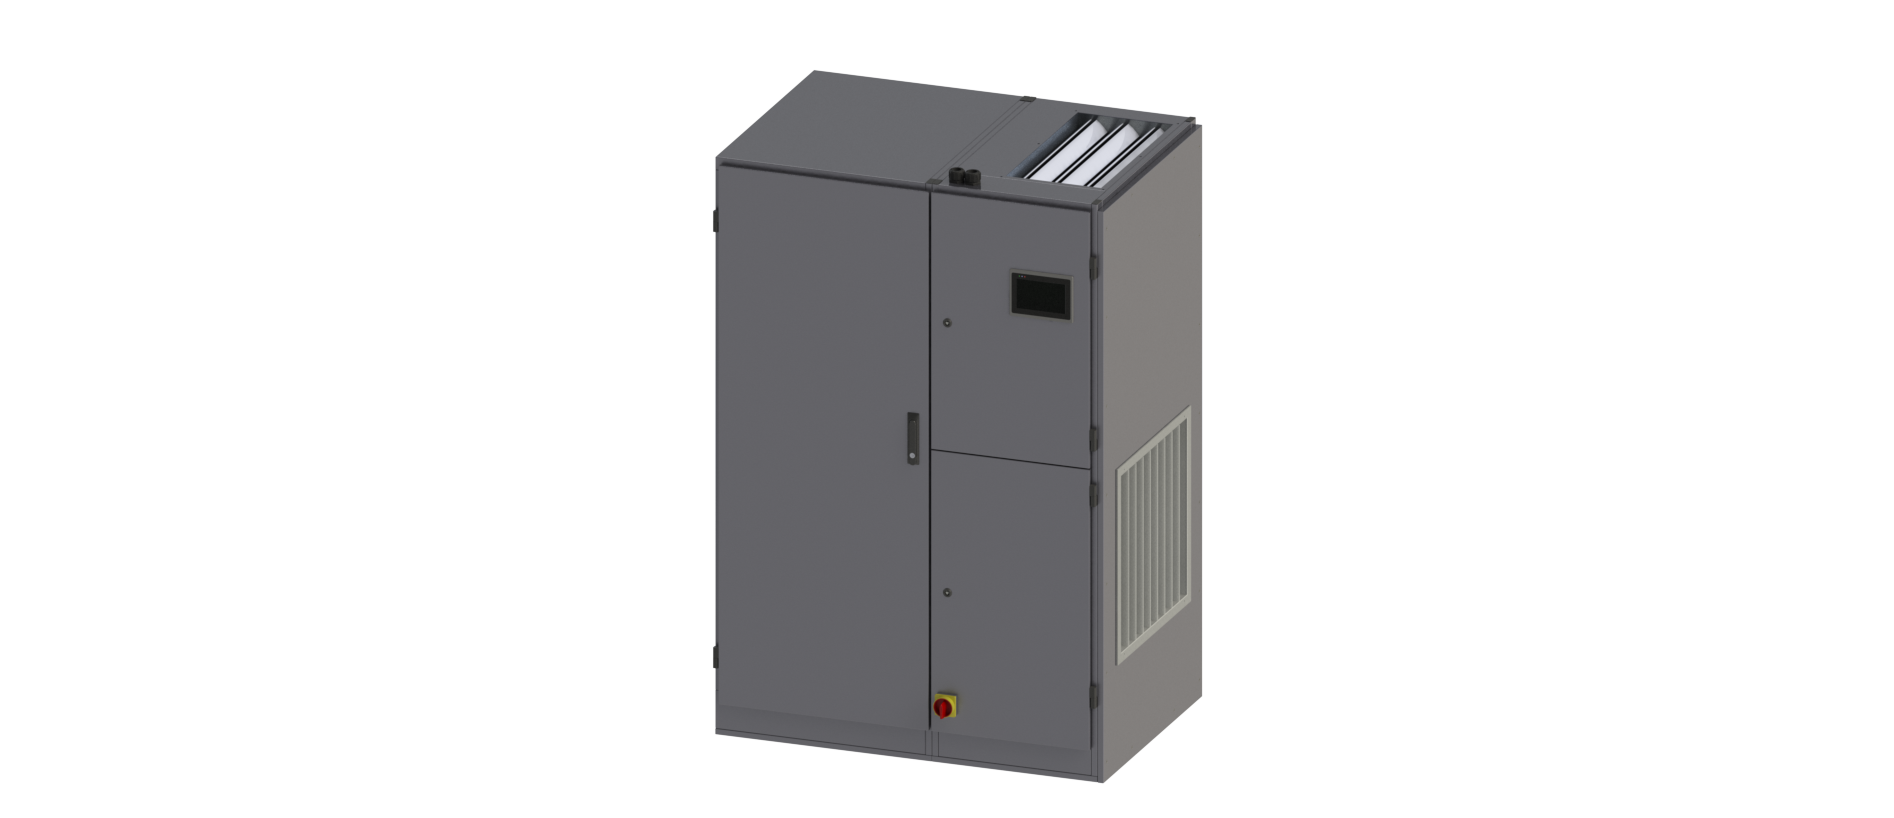 ECT 5400 CloudCooler